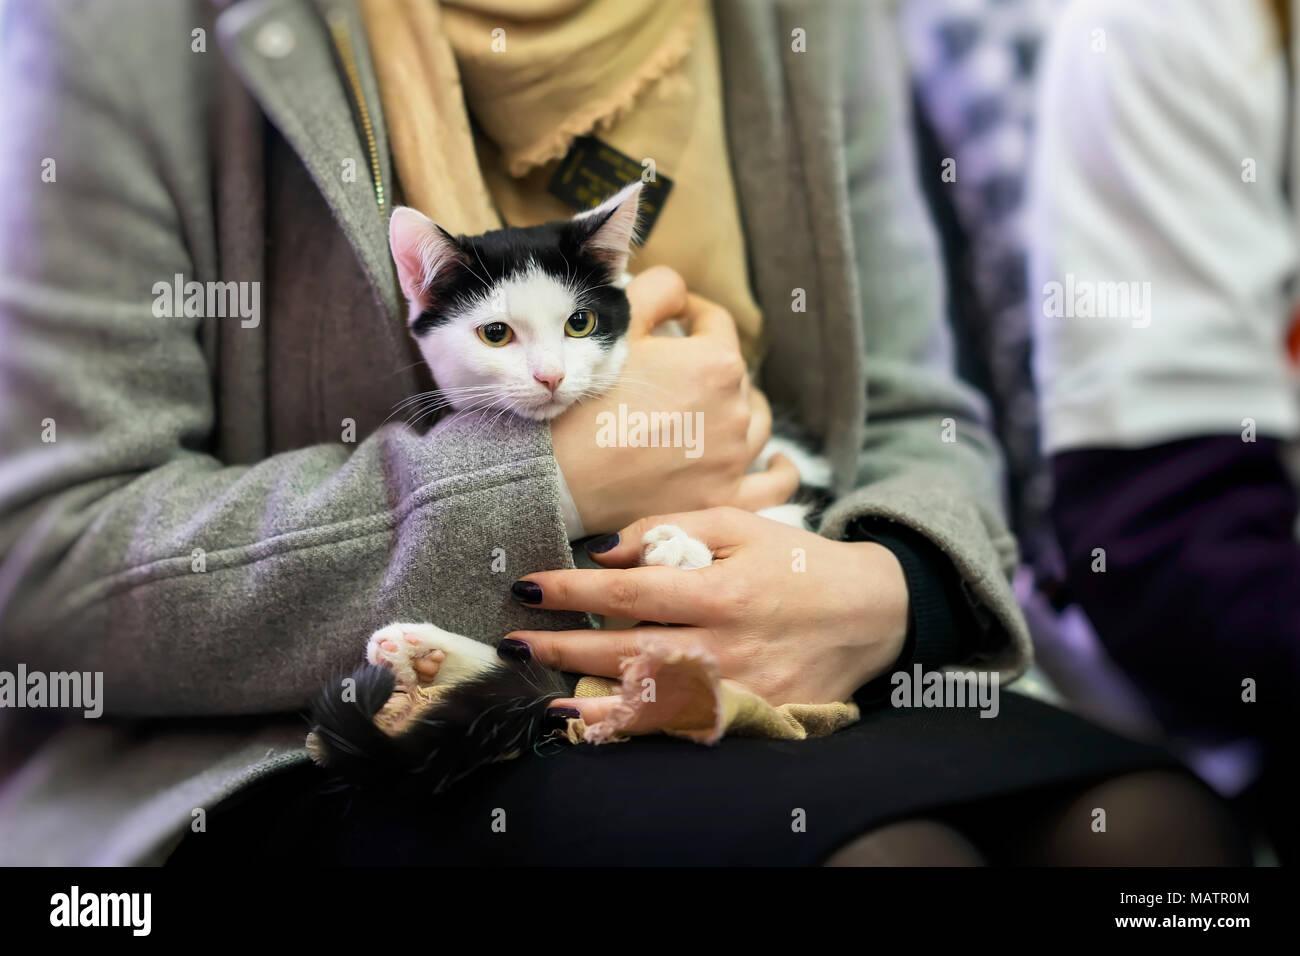 Frightened black and white kitten in hands of girl volunteer, in shelter for homeless animals. Girl takes cat to her home. - Stock Image